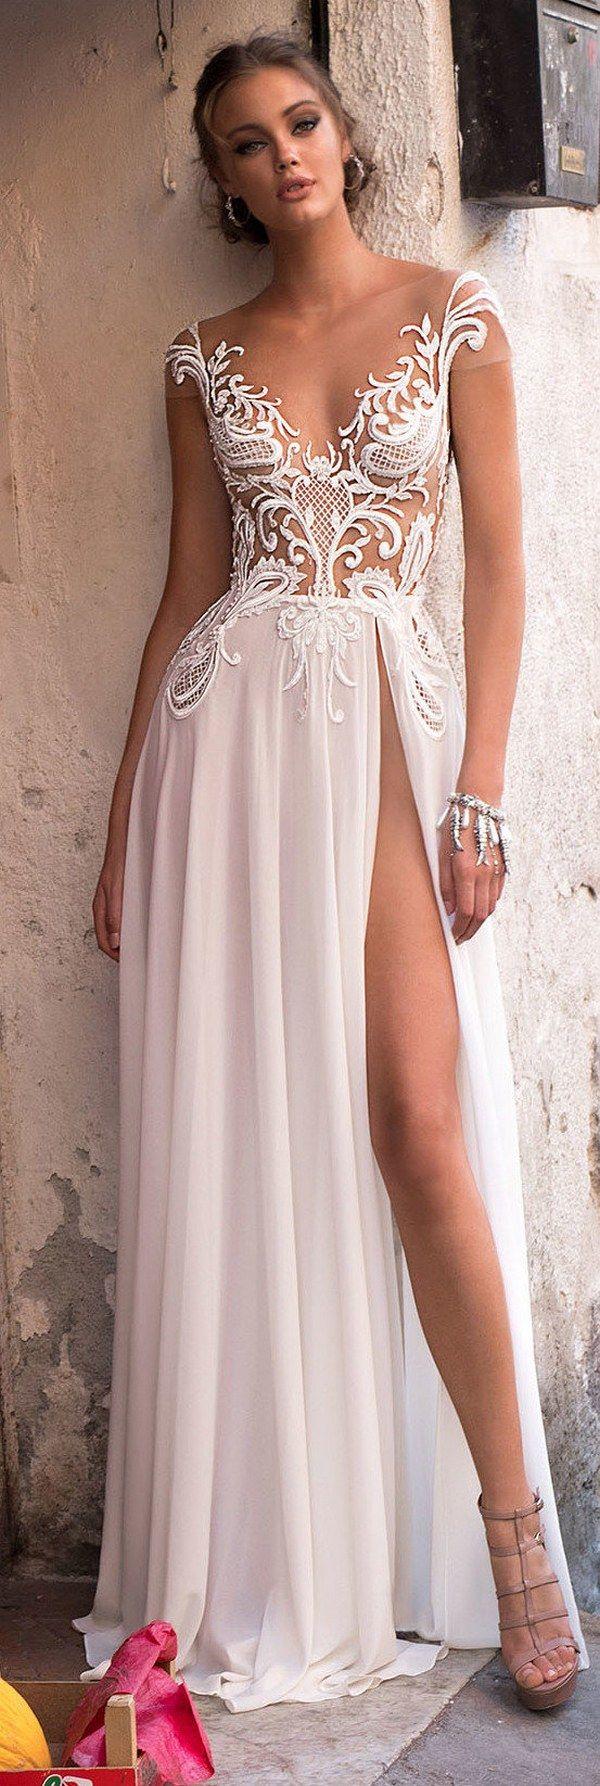 Stunning wedding dresses  MUSE by Berta Sicily Wedding Dresses  weddingdress wedding